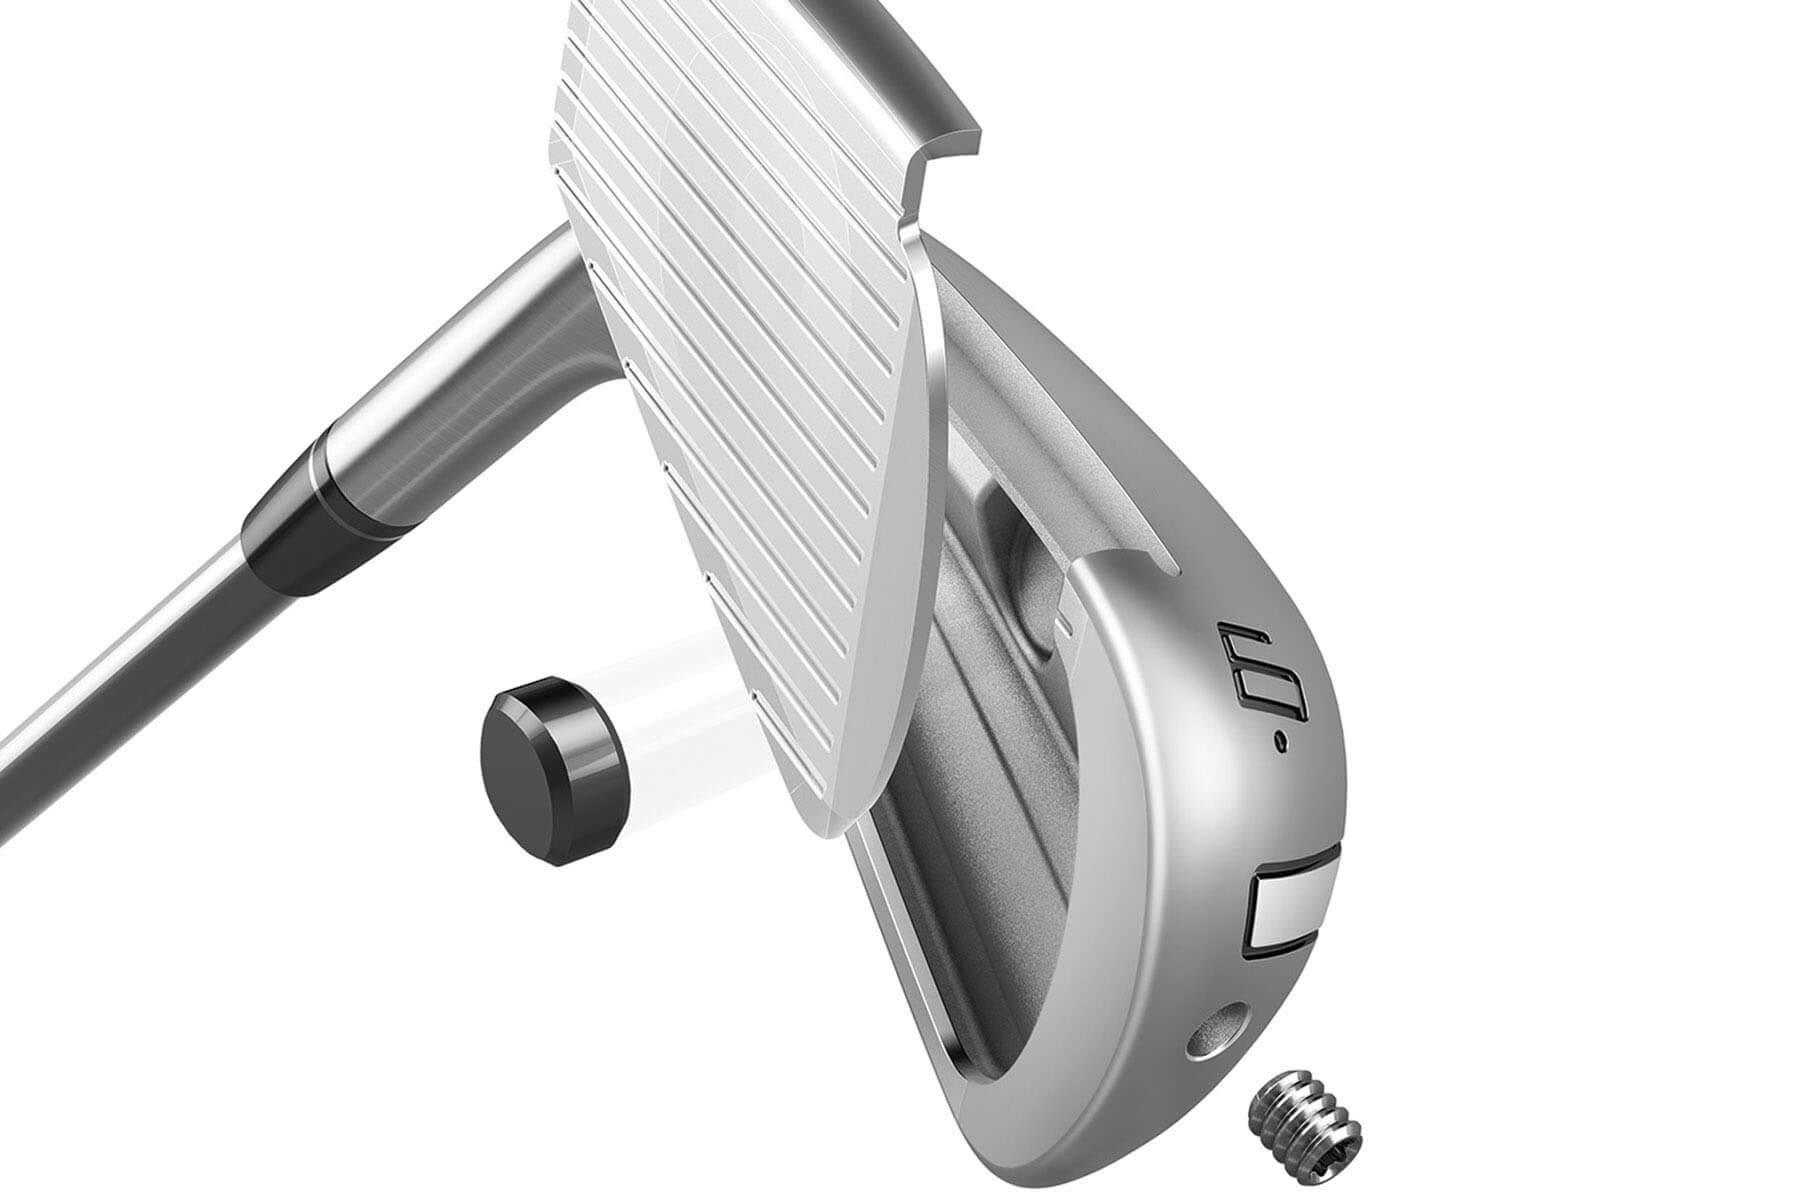 Taylormade P790 Iron